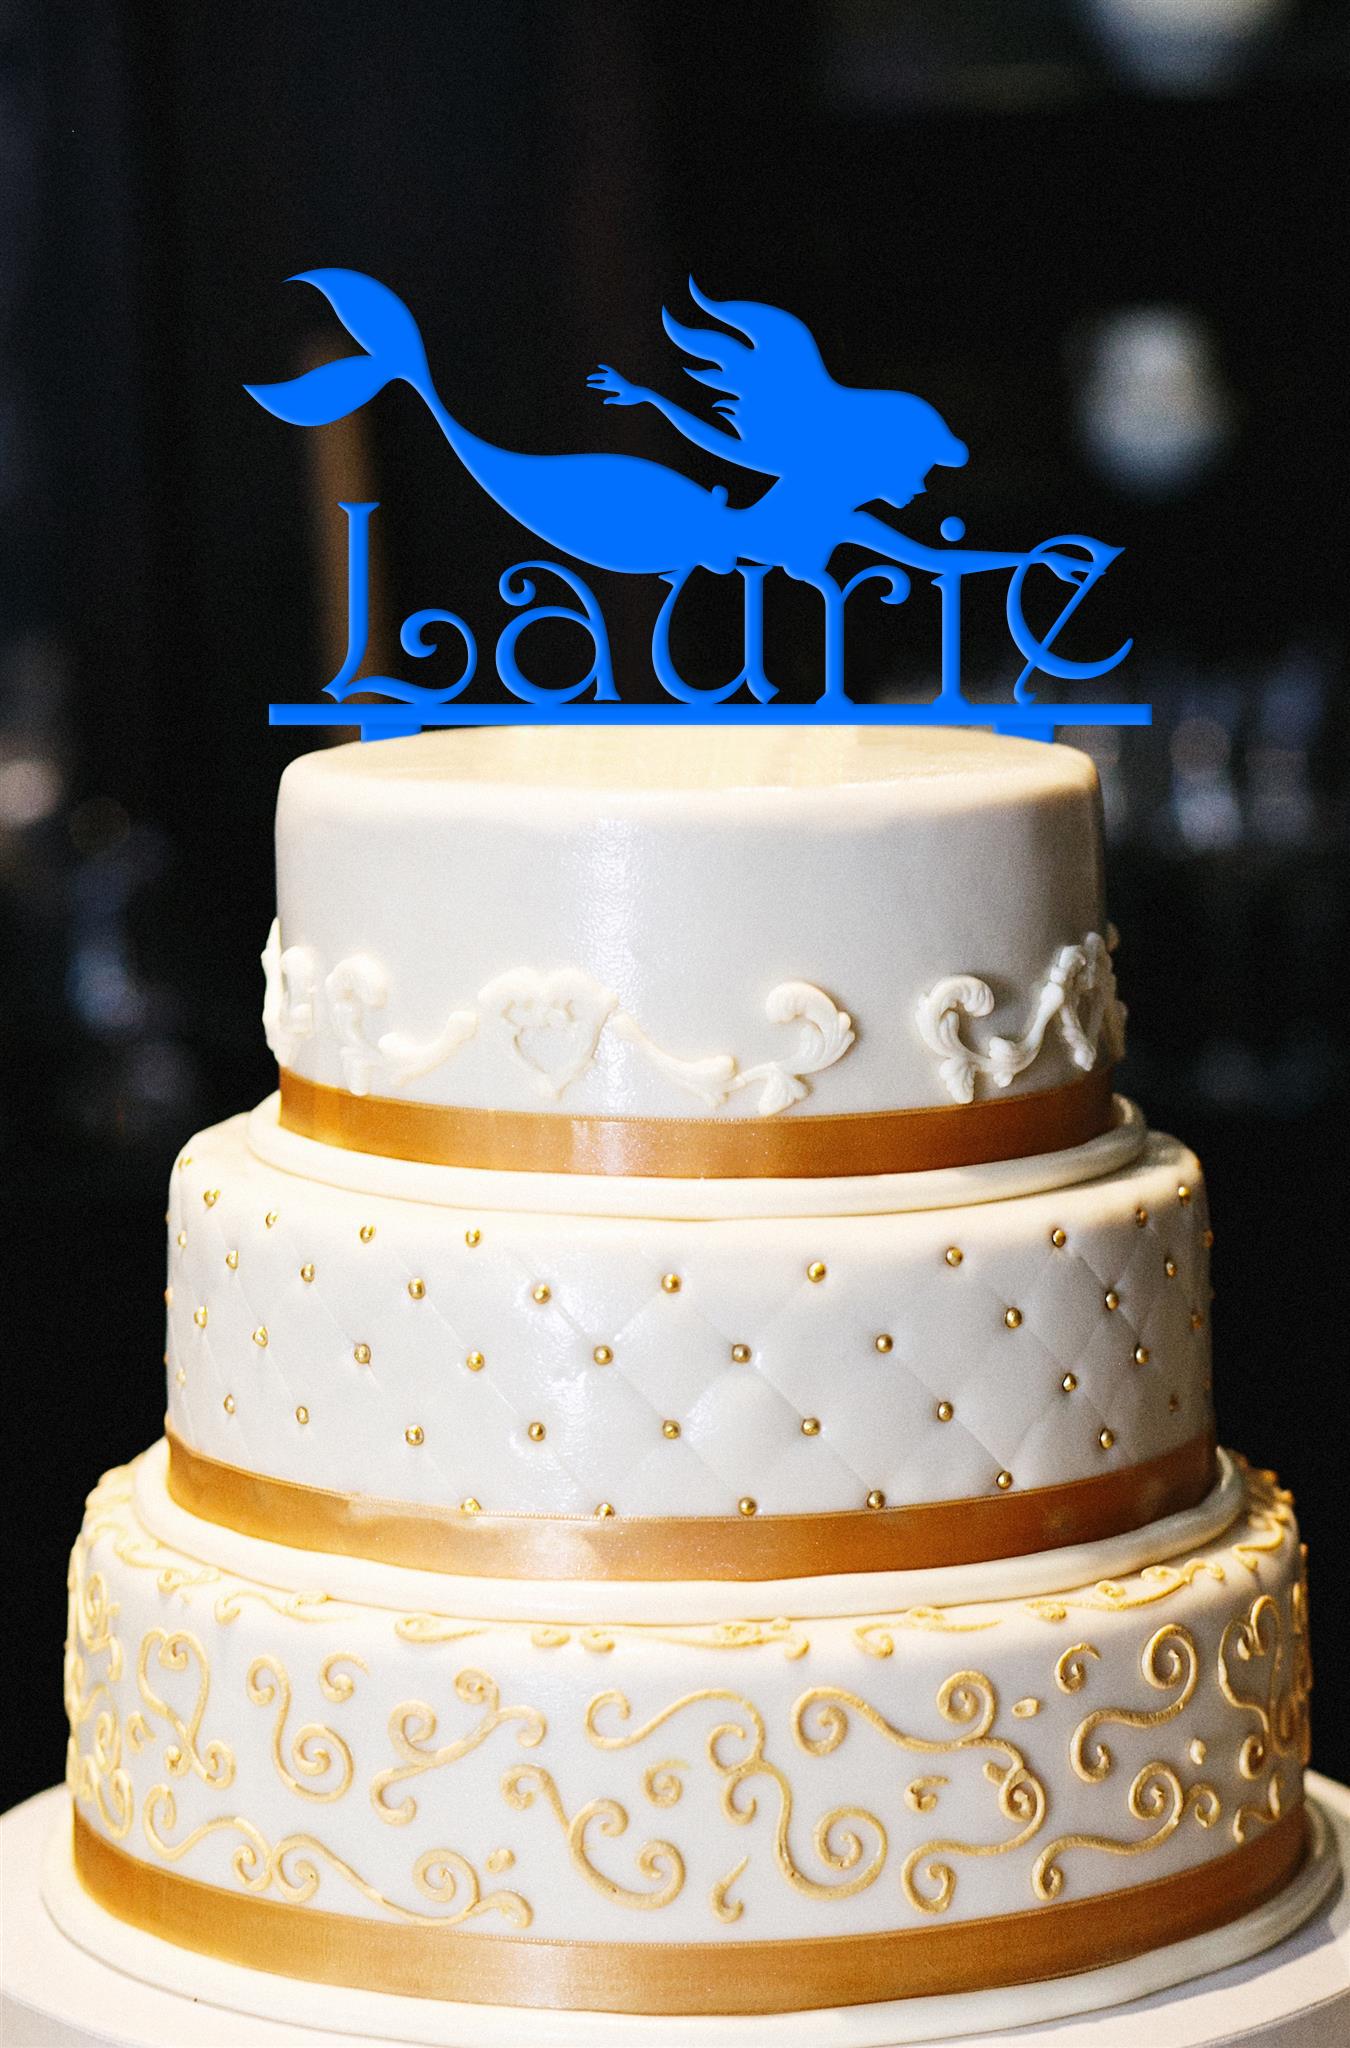 Marvelous Mermaid Birthday Cake Topper Personalized By Kate Personalised Birthday Cards Veneteletsinfo